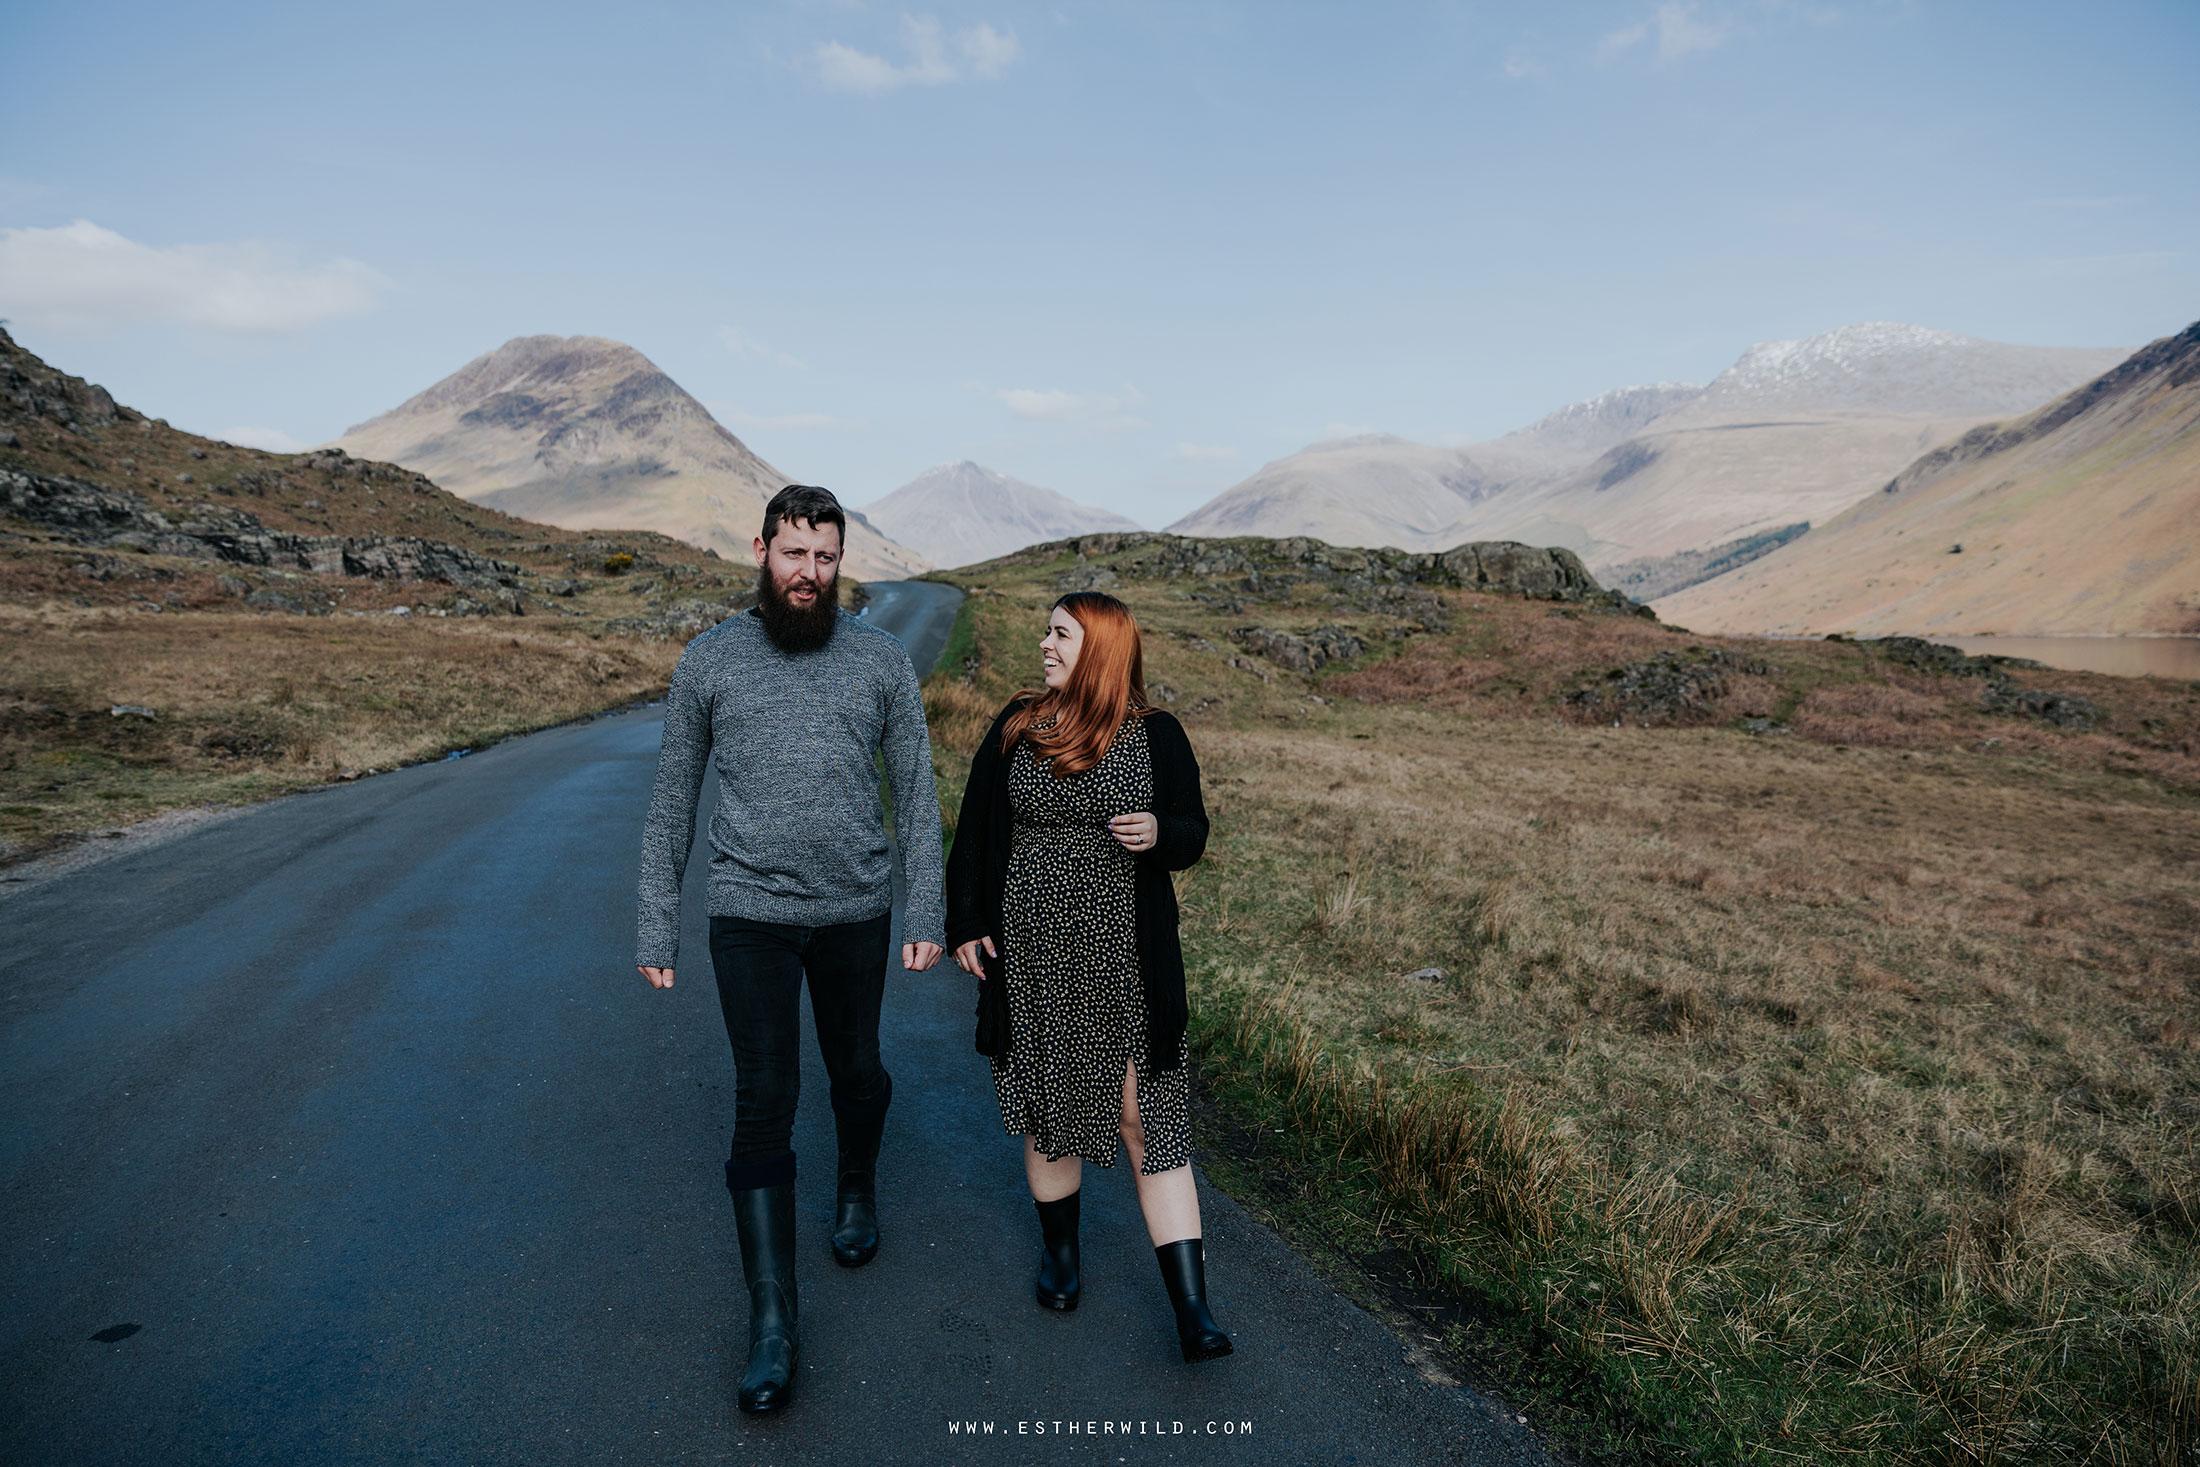 Cumbria_Lake_District_Wasdale_Wedding_Photographer_Destination_Engagement_Anniversary_Esther_Wild_IMG_3210.jpg